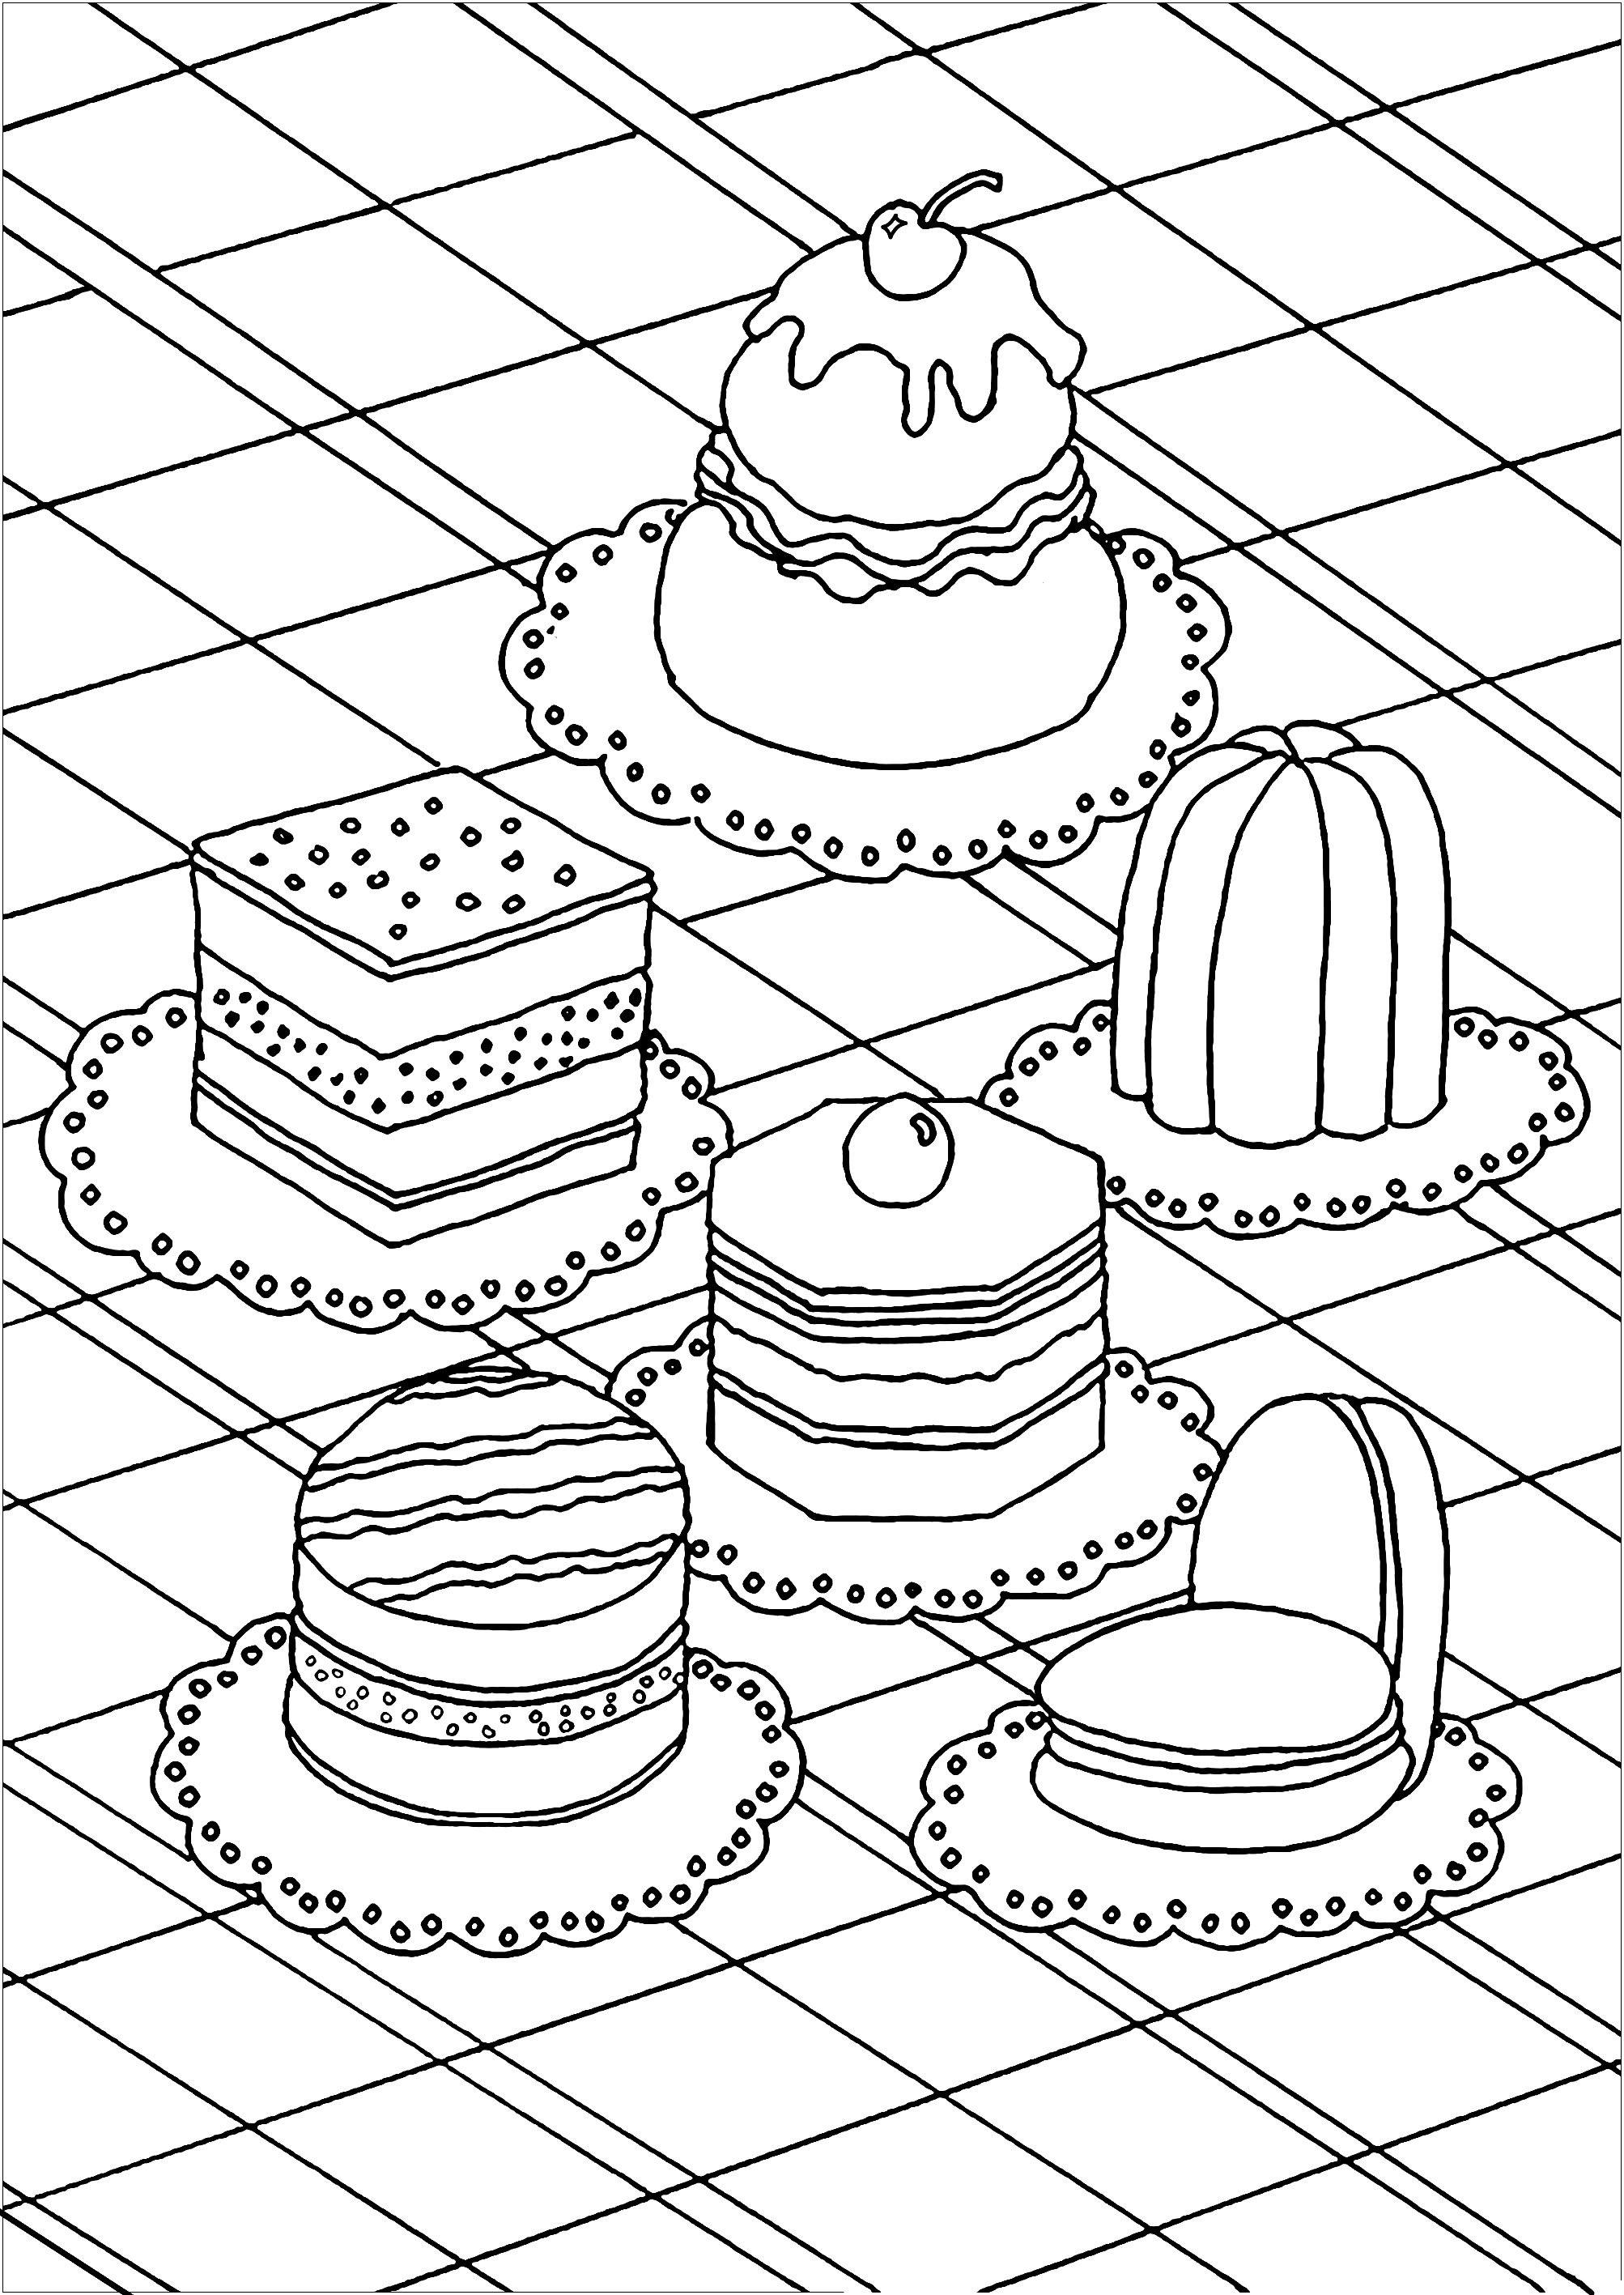 Colorear para Adultos : Cup Cakes - 1